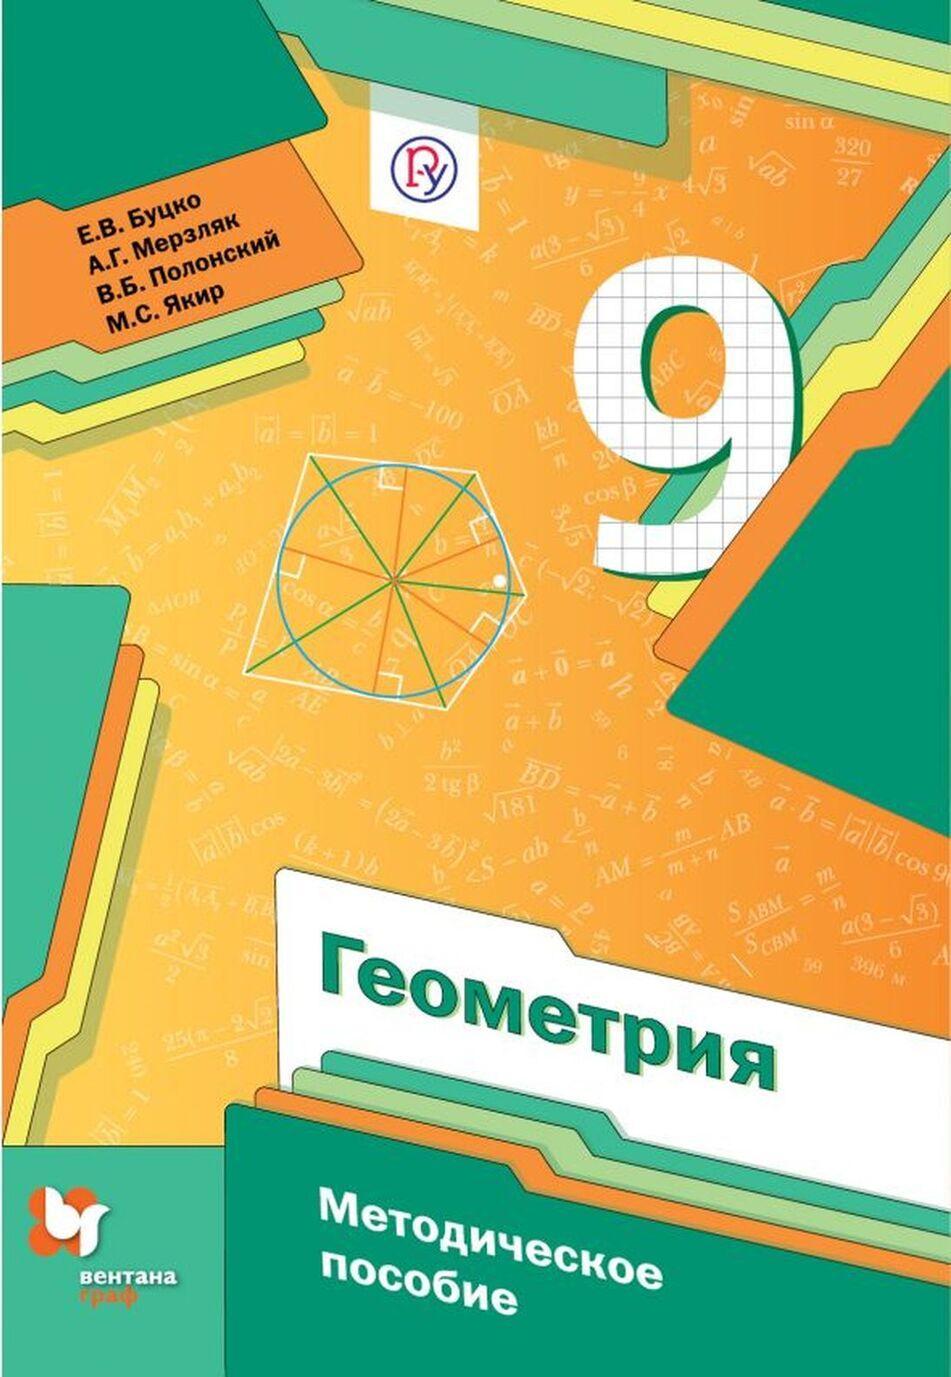 Geometrija. 9 klass. Metodicheskoe posobie | Butsko Elena Vladimirovna, Jakir Mikhail Semenovich